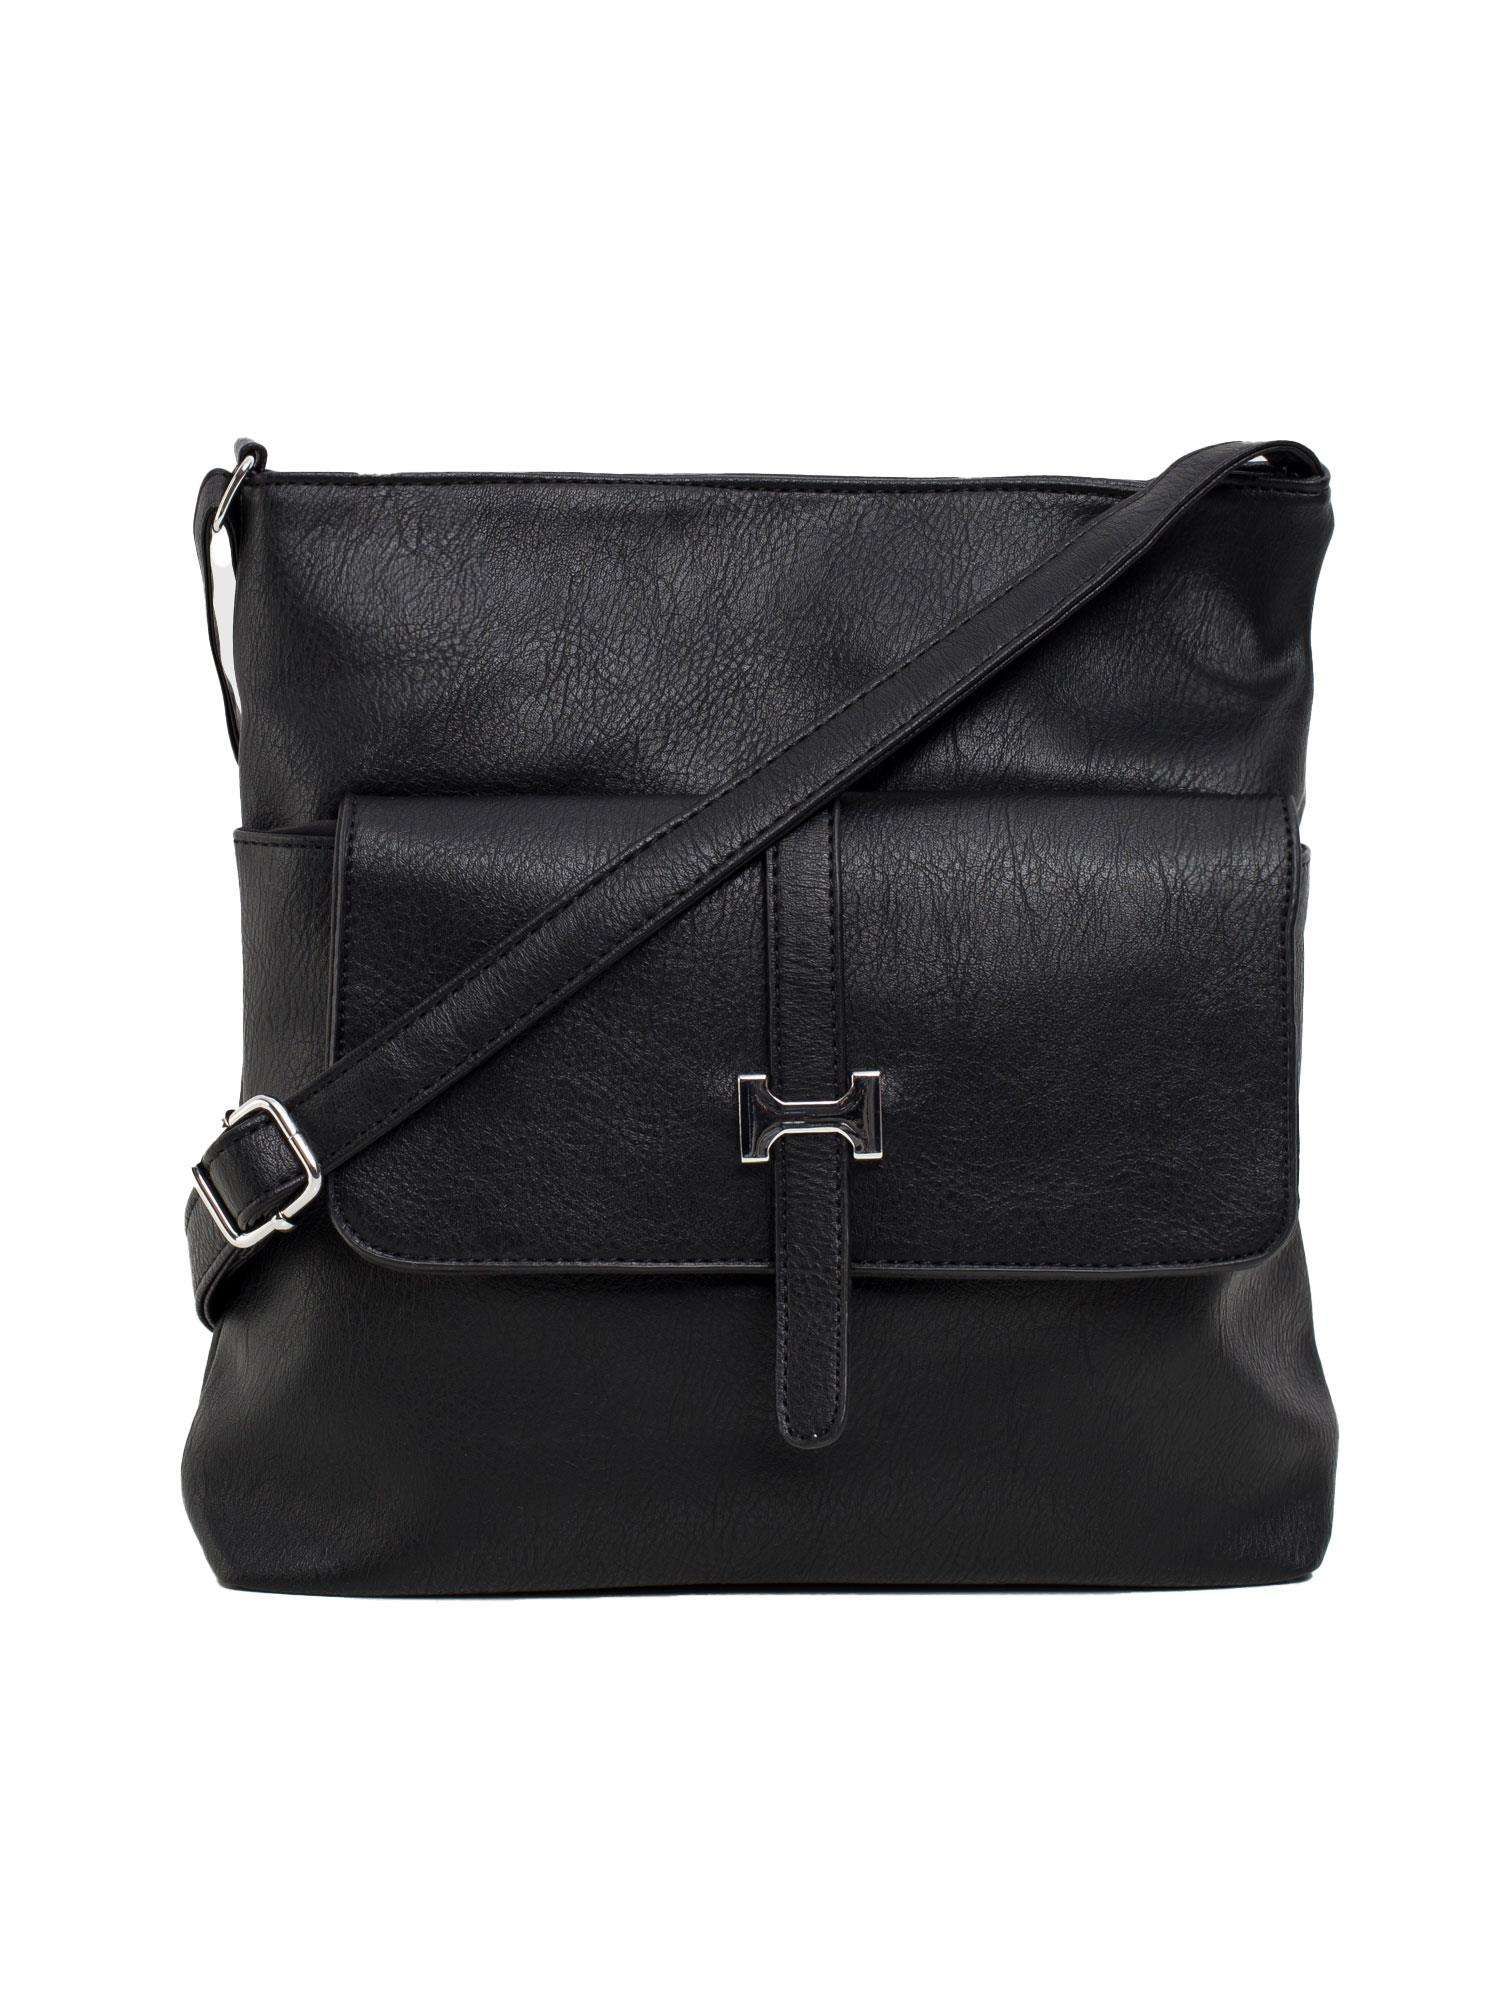 Čierna klopová taška ONE SIZE